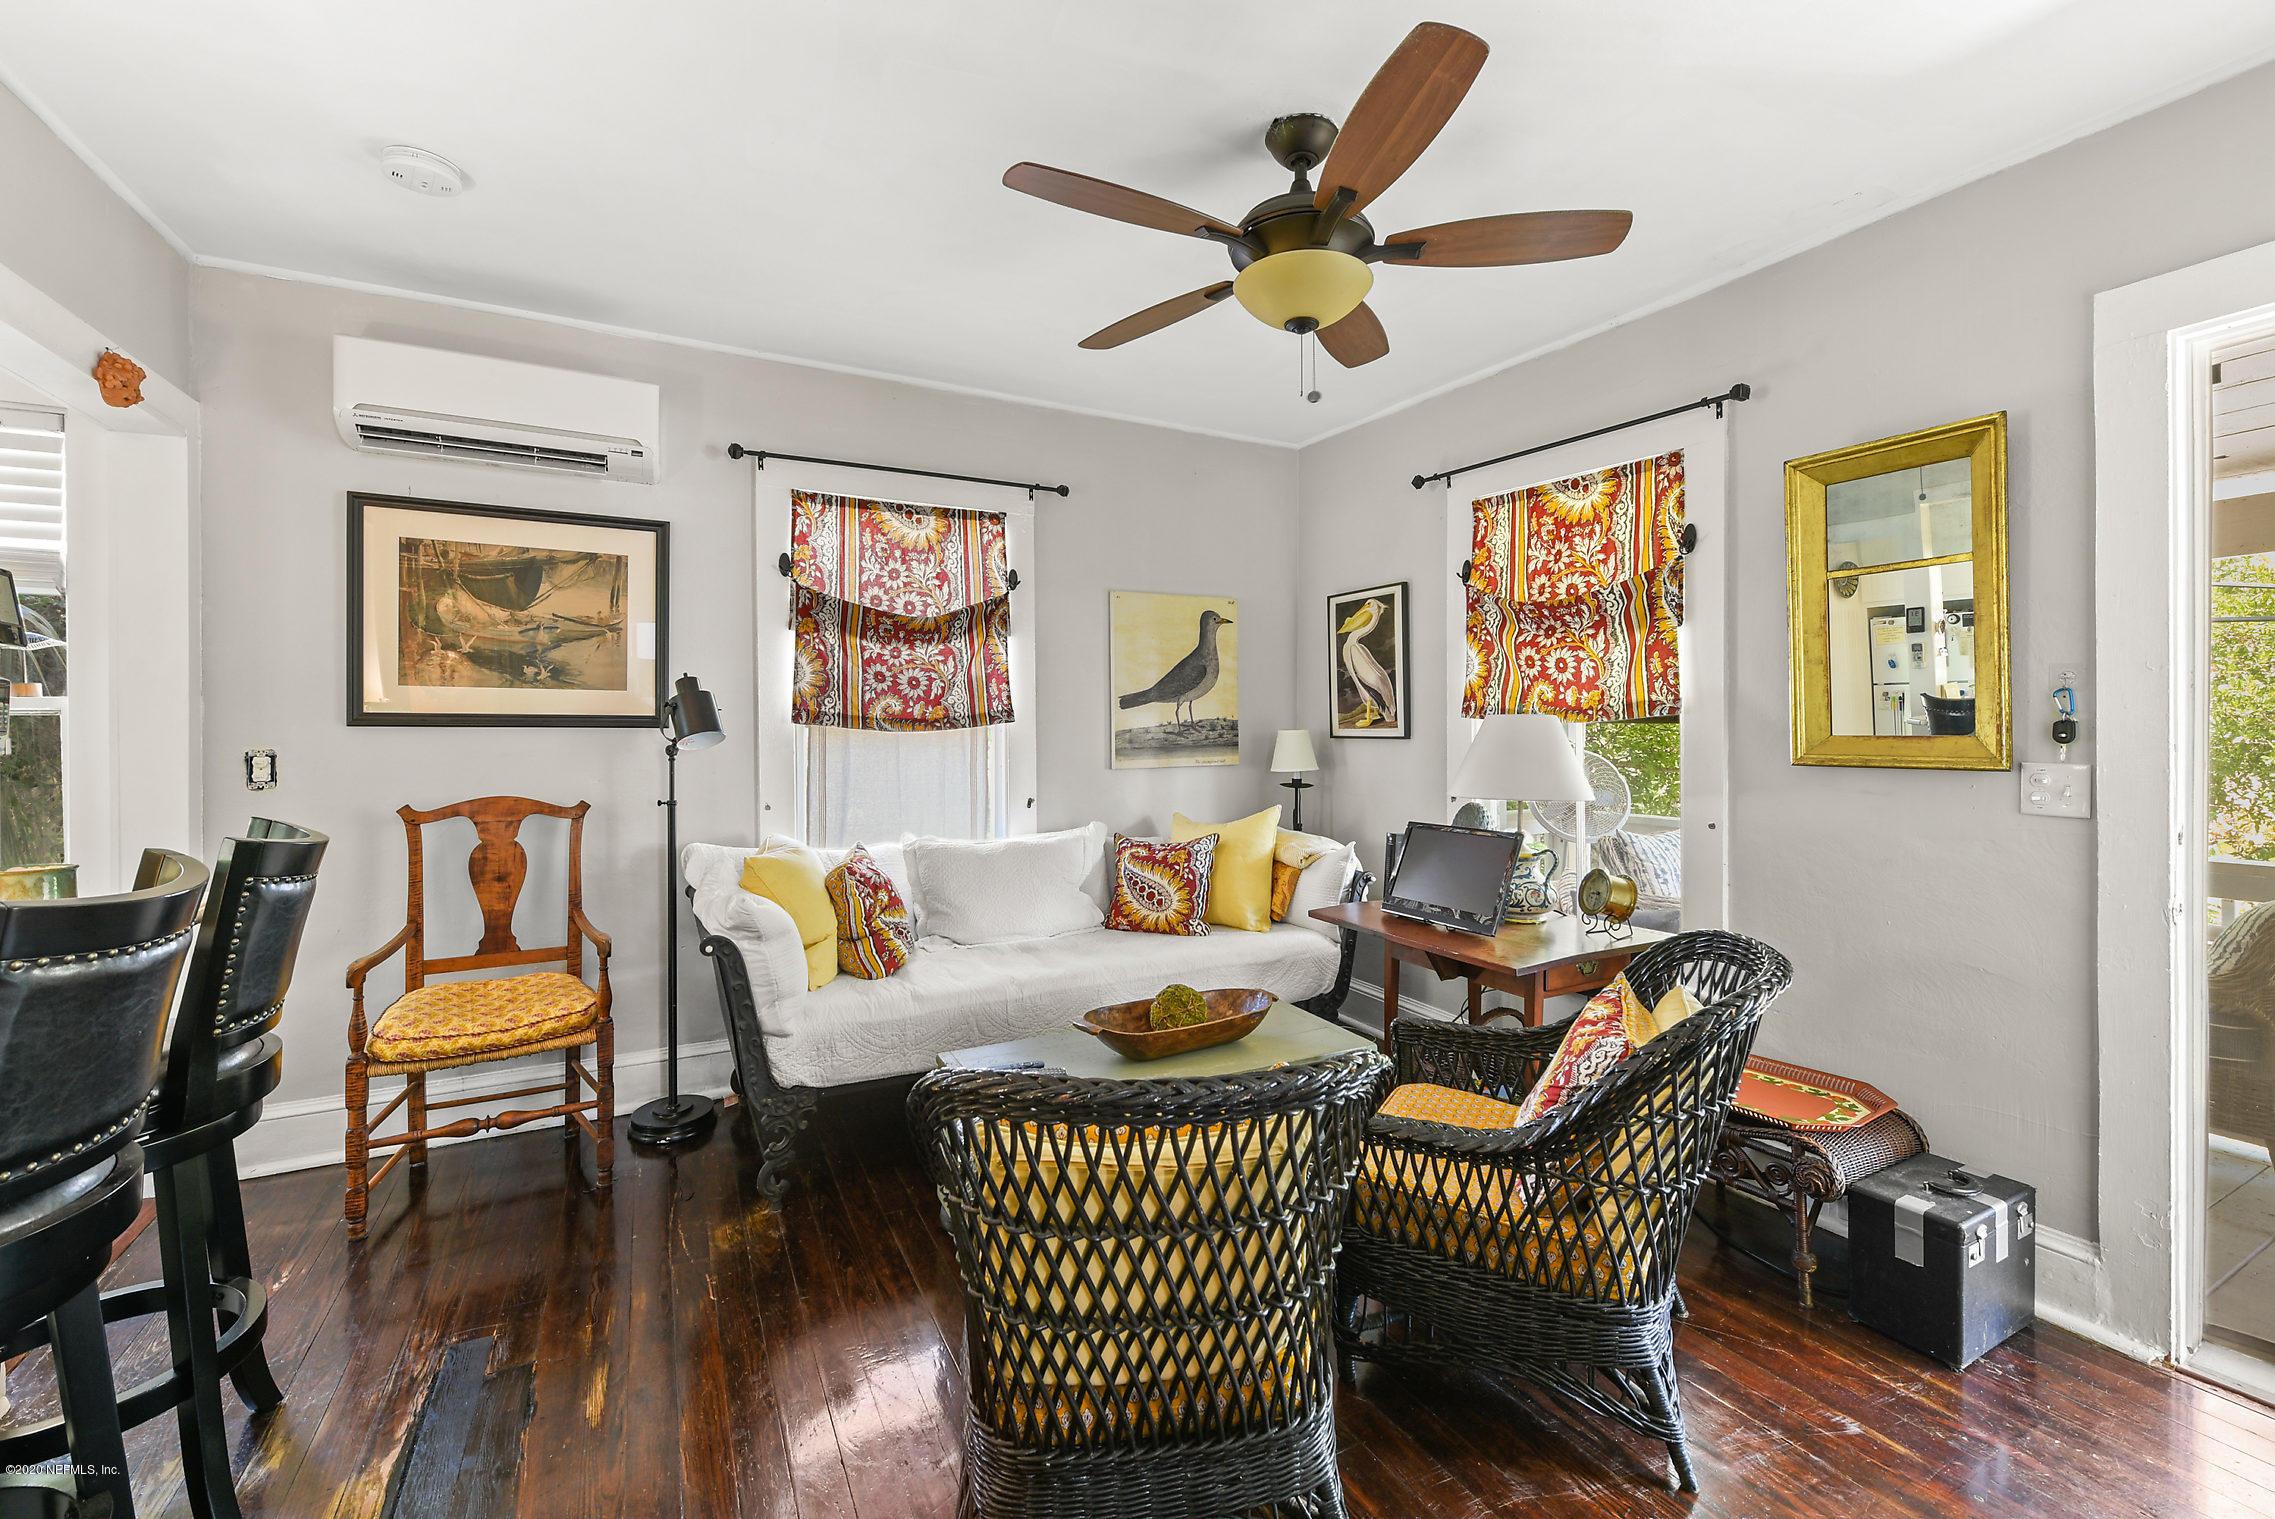 80 WATER, ST AUGUSTINE, FLORIDA 32084, 7 Bedrooms Bedrooms, ,6 BathroomsBathrooms,Residential,For sale,WATER,1060511